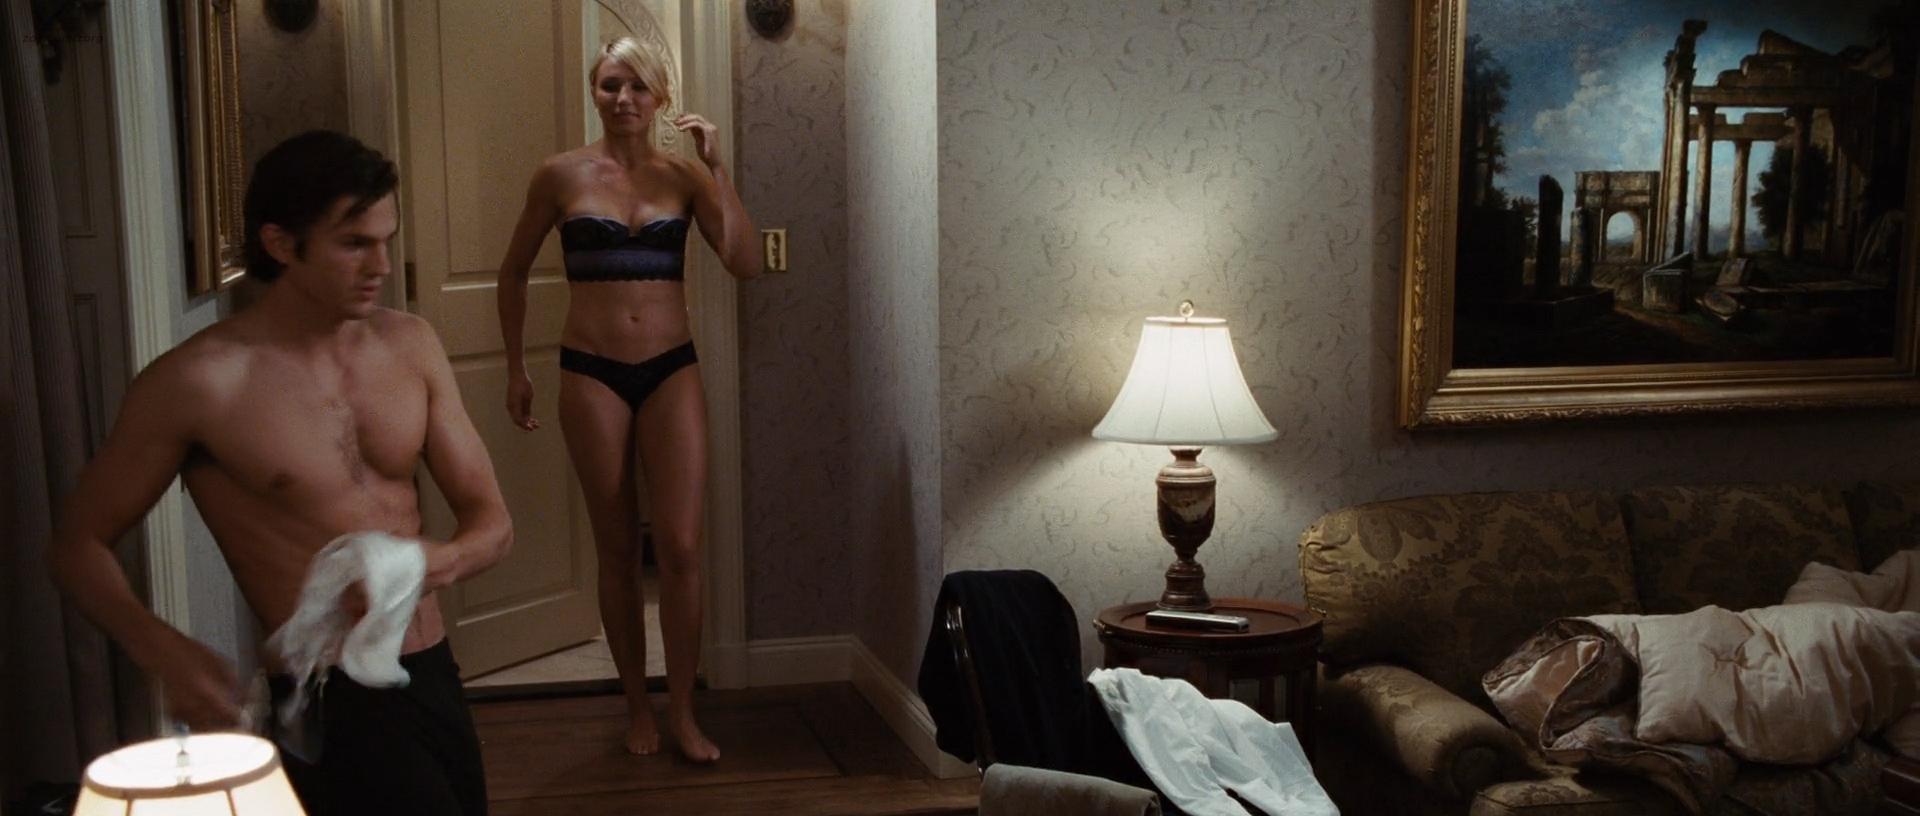 Cameron Diaz hot Krysten Ritter lingerie and Lake Bell hot in undies - What Happens In Vegas (2008) hd1080p (2)